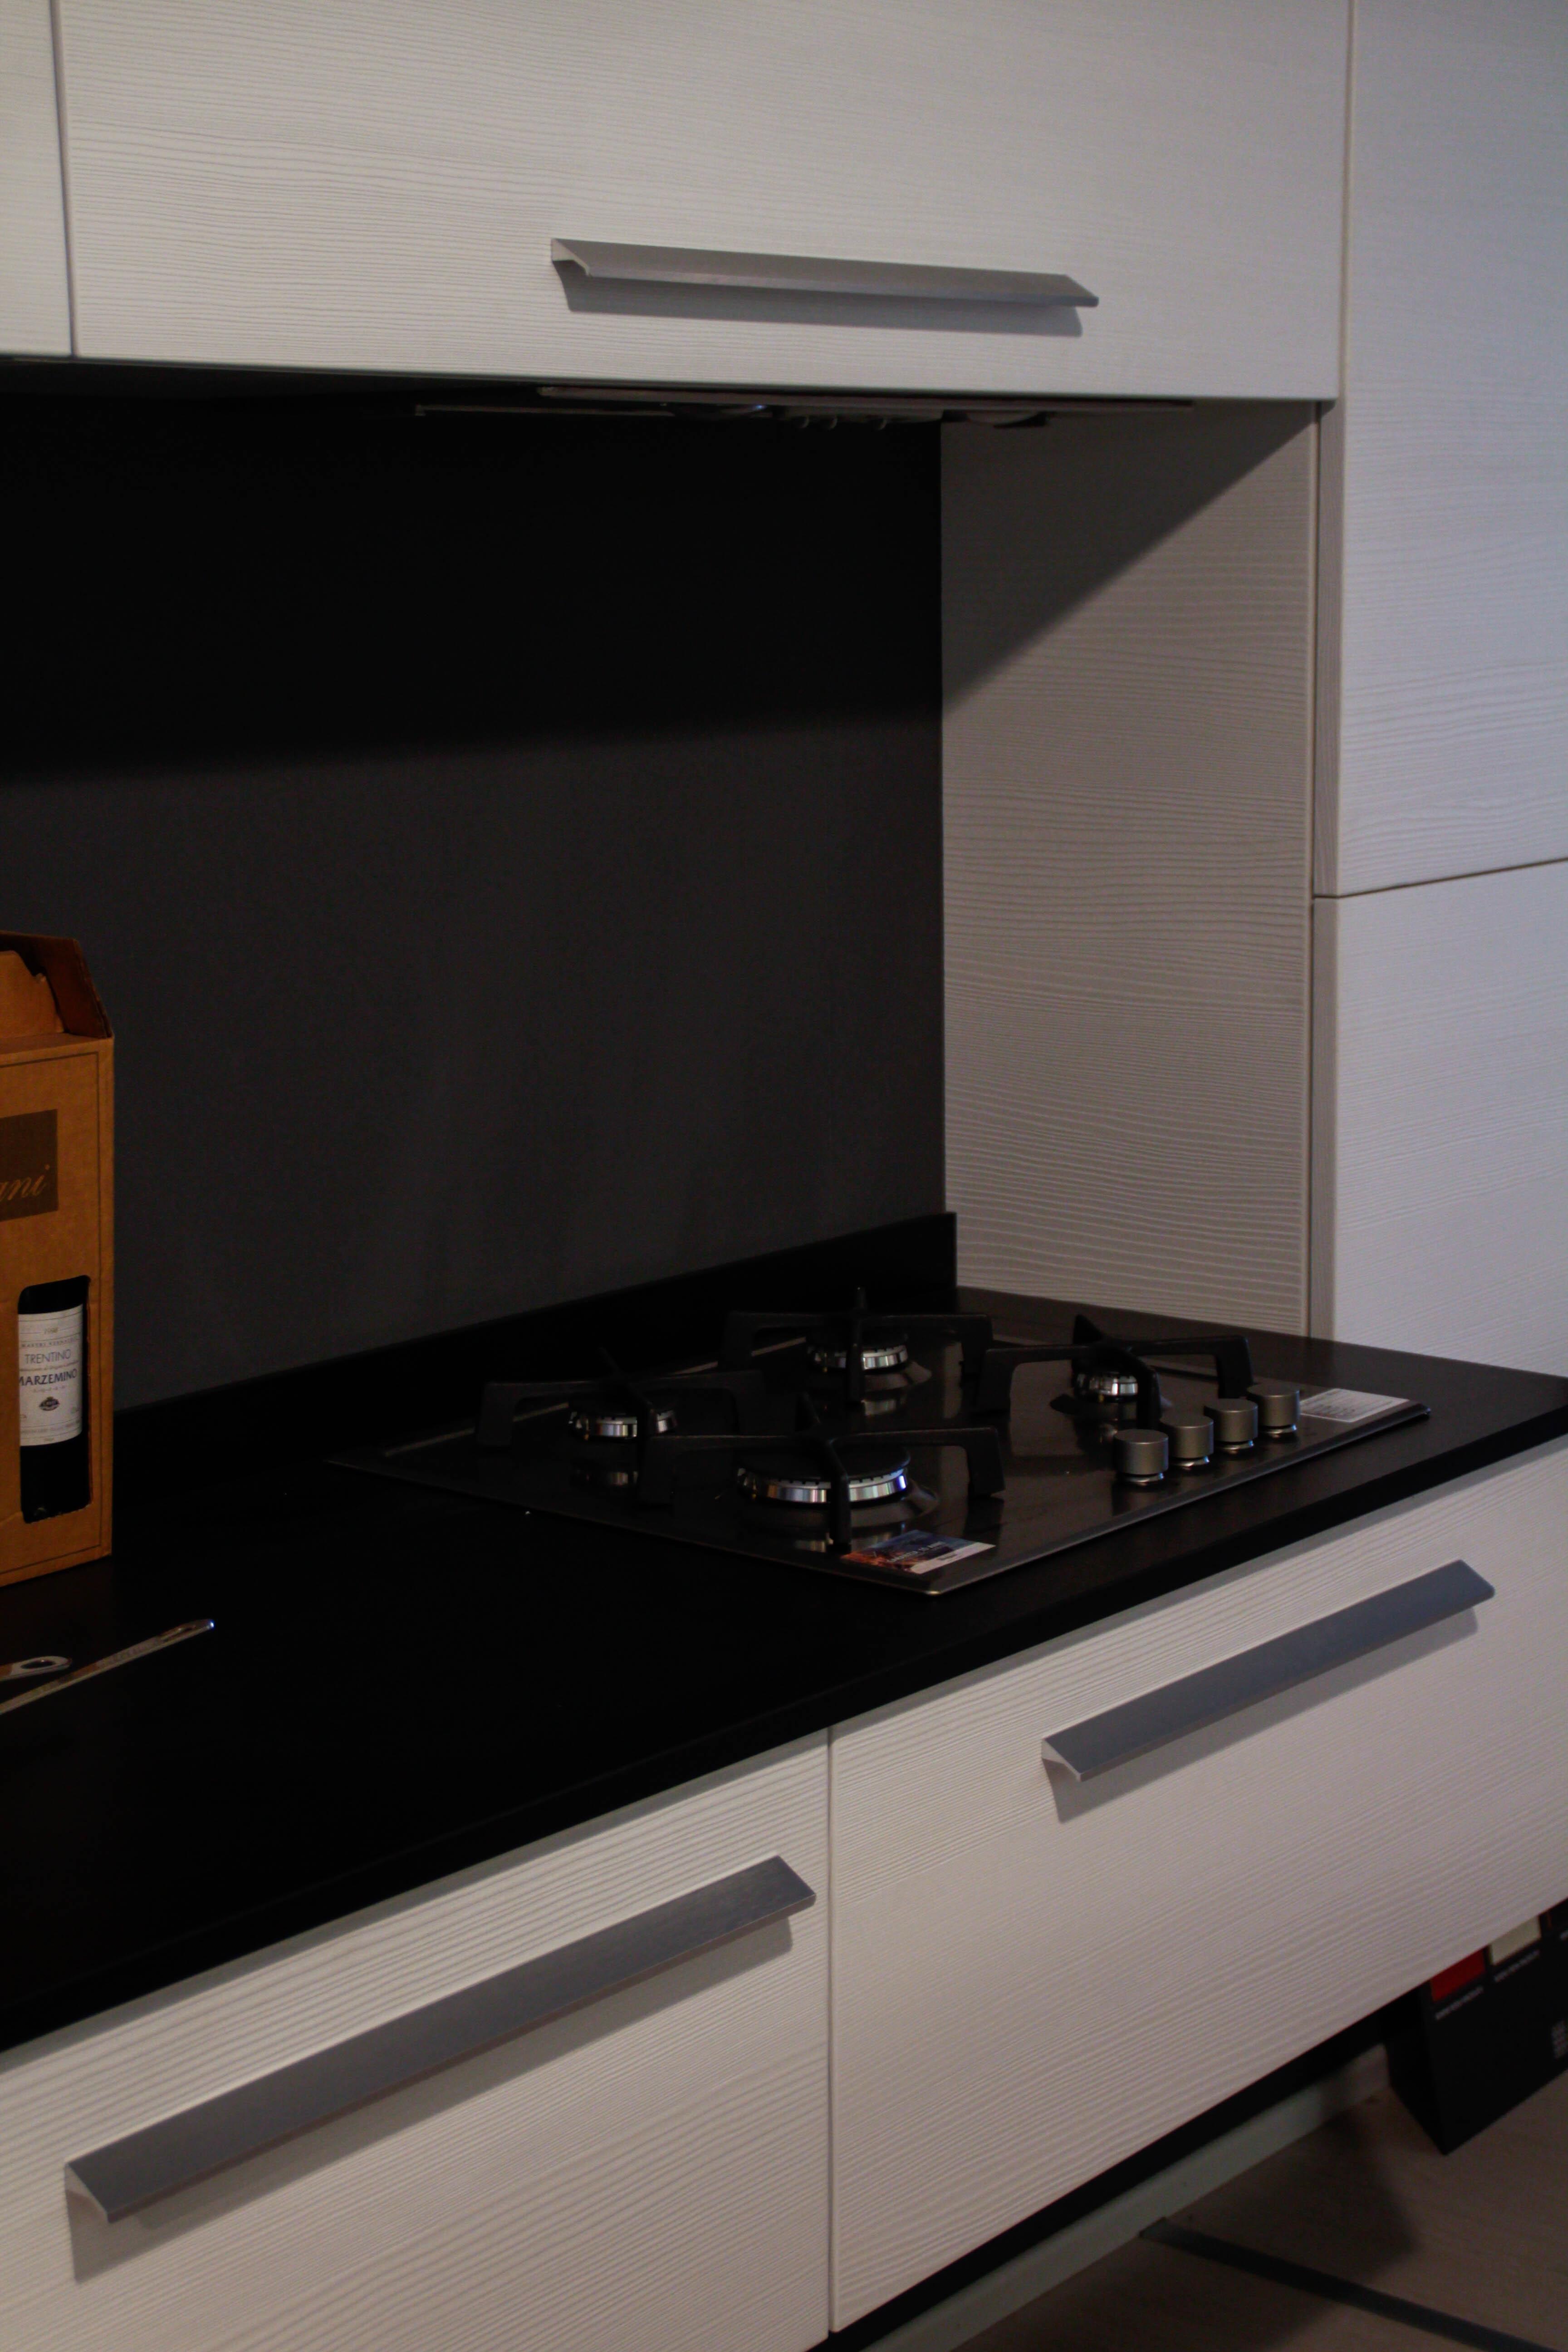 Cucine Su Misura Ikea. Top Ikea Quanto Costa Una Cucina Su Misura ...